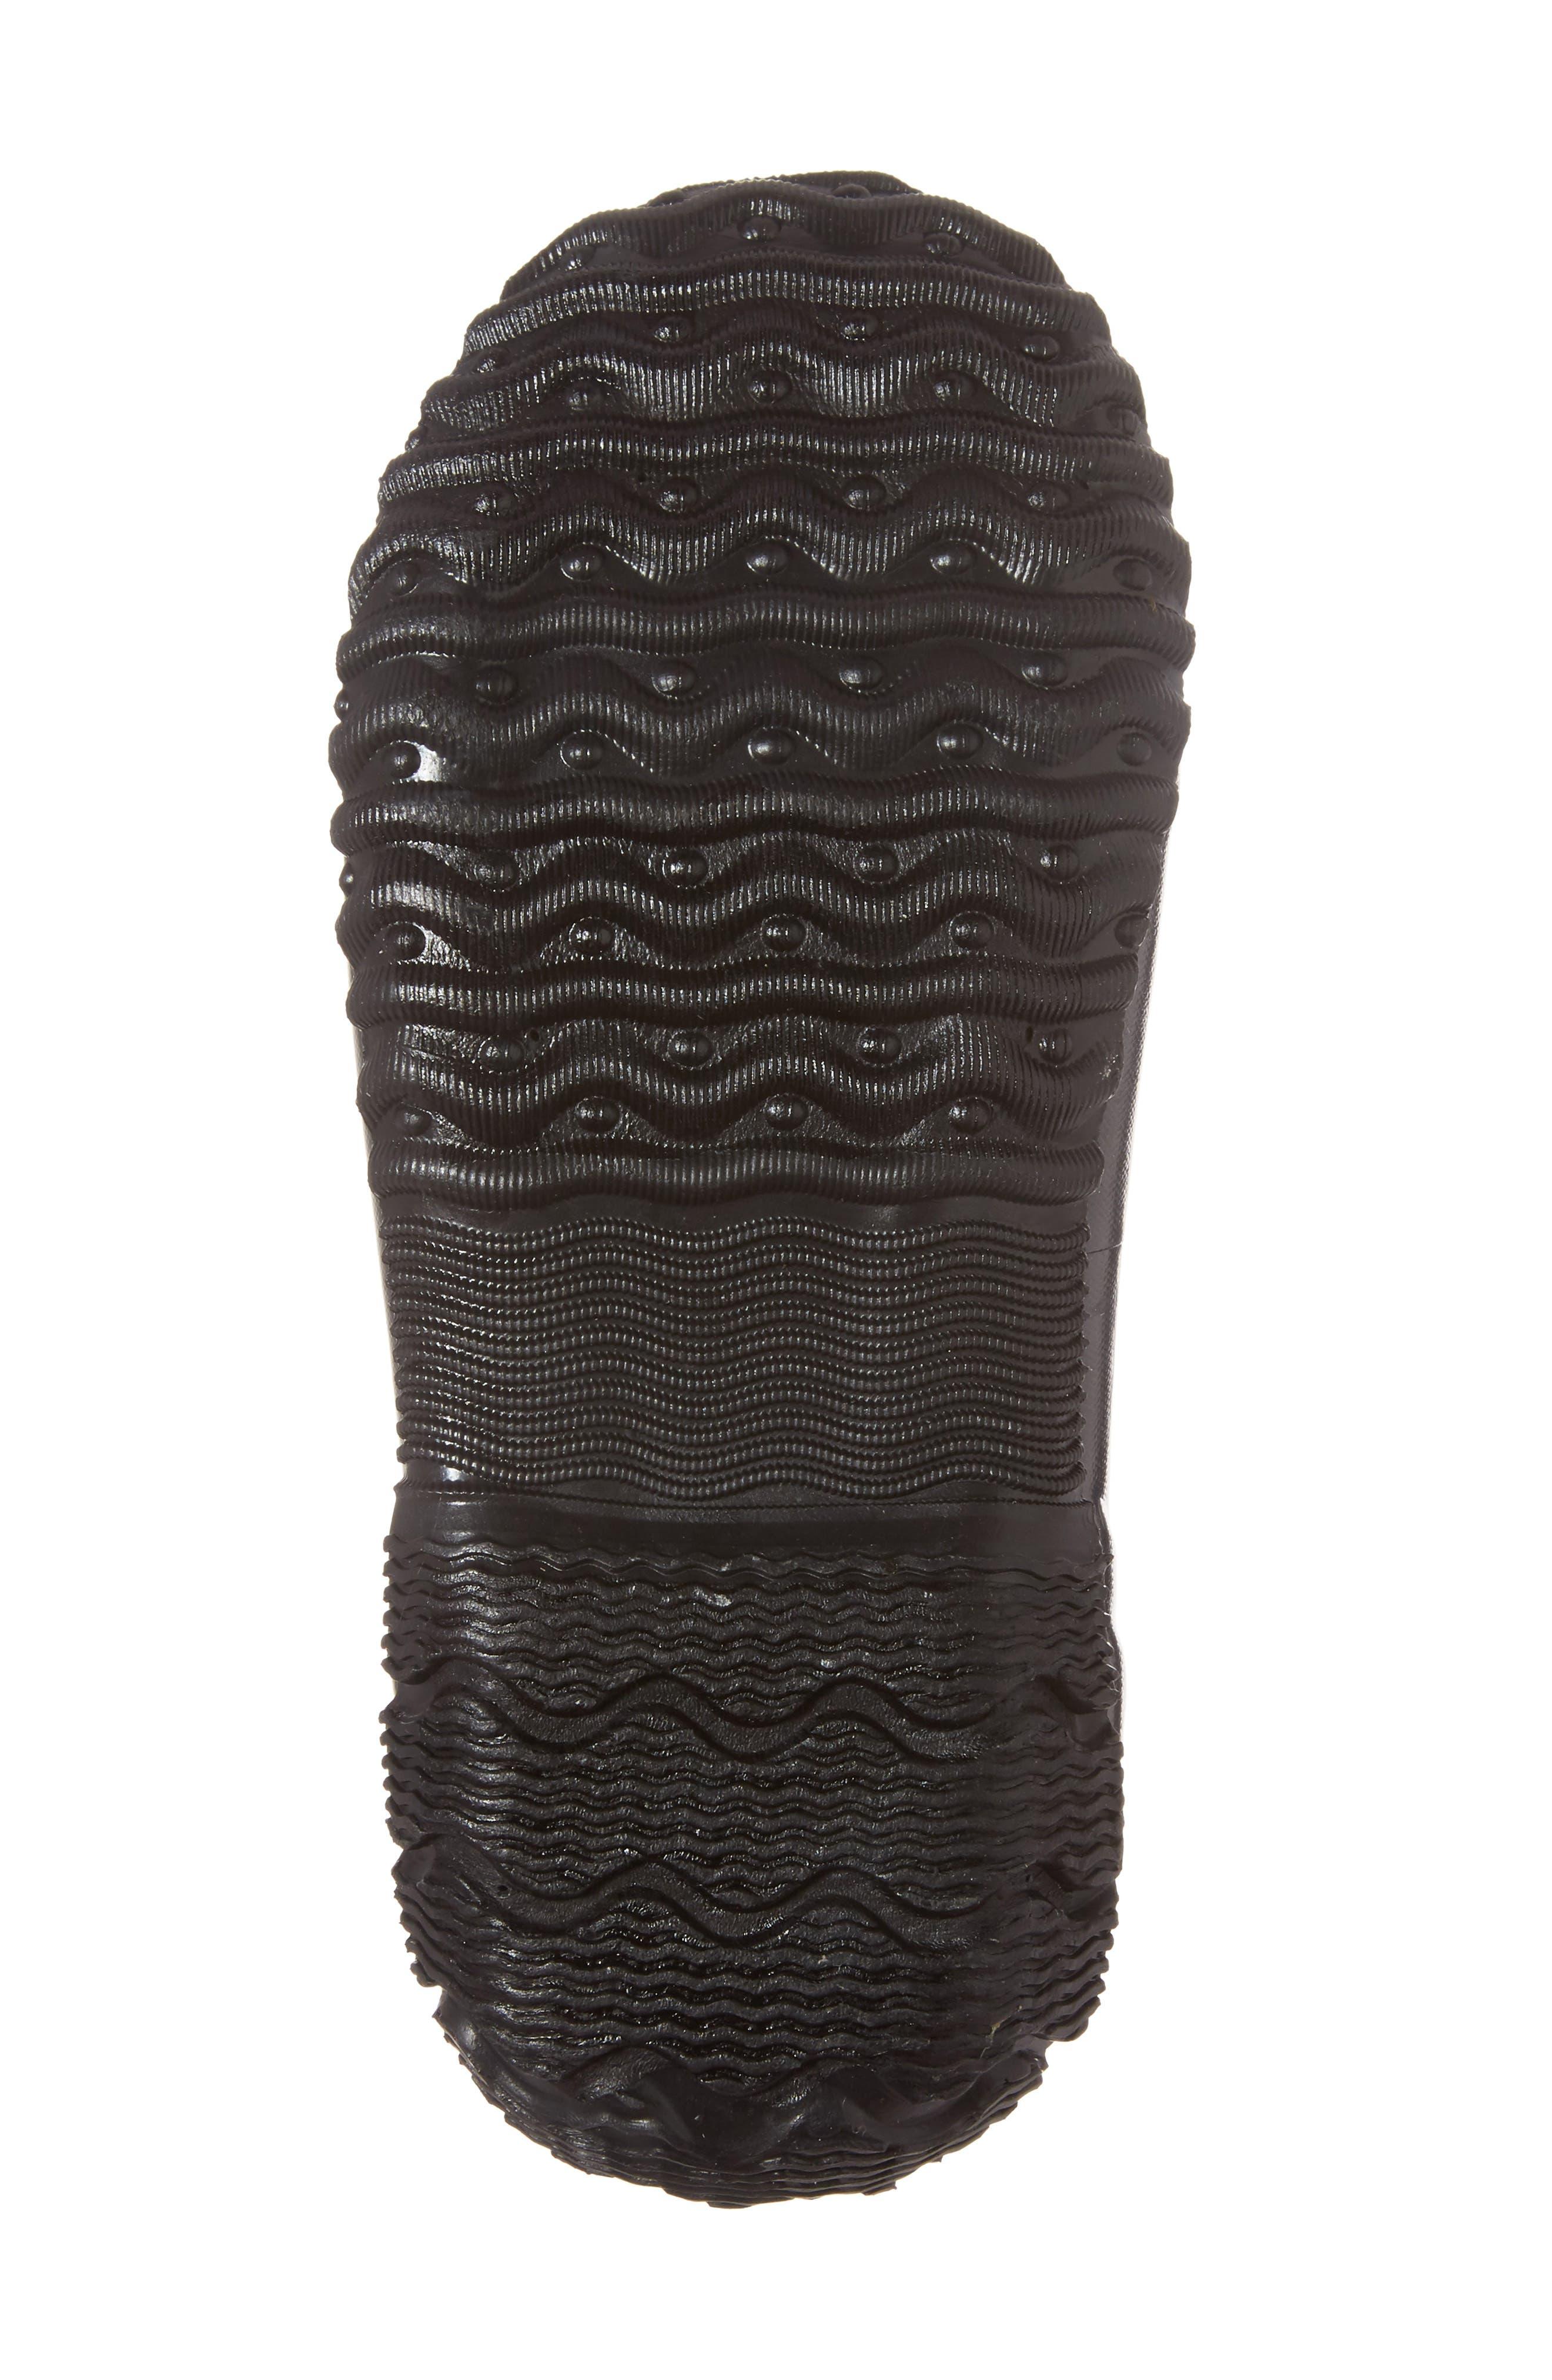 Classic Pansies Insulated Waterproof Rain Boot,                             Alternate thumbnail 6, color,                             BLACK MULTI